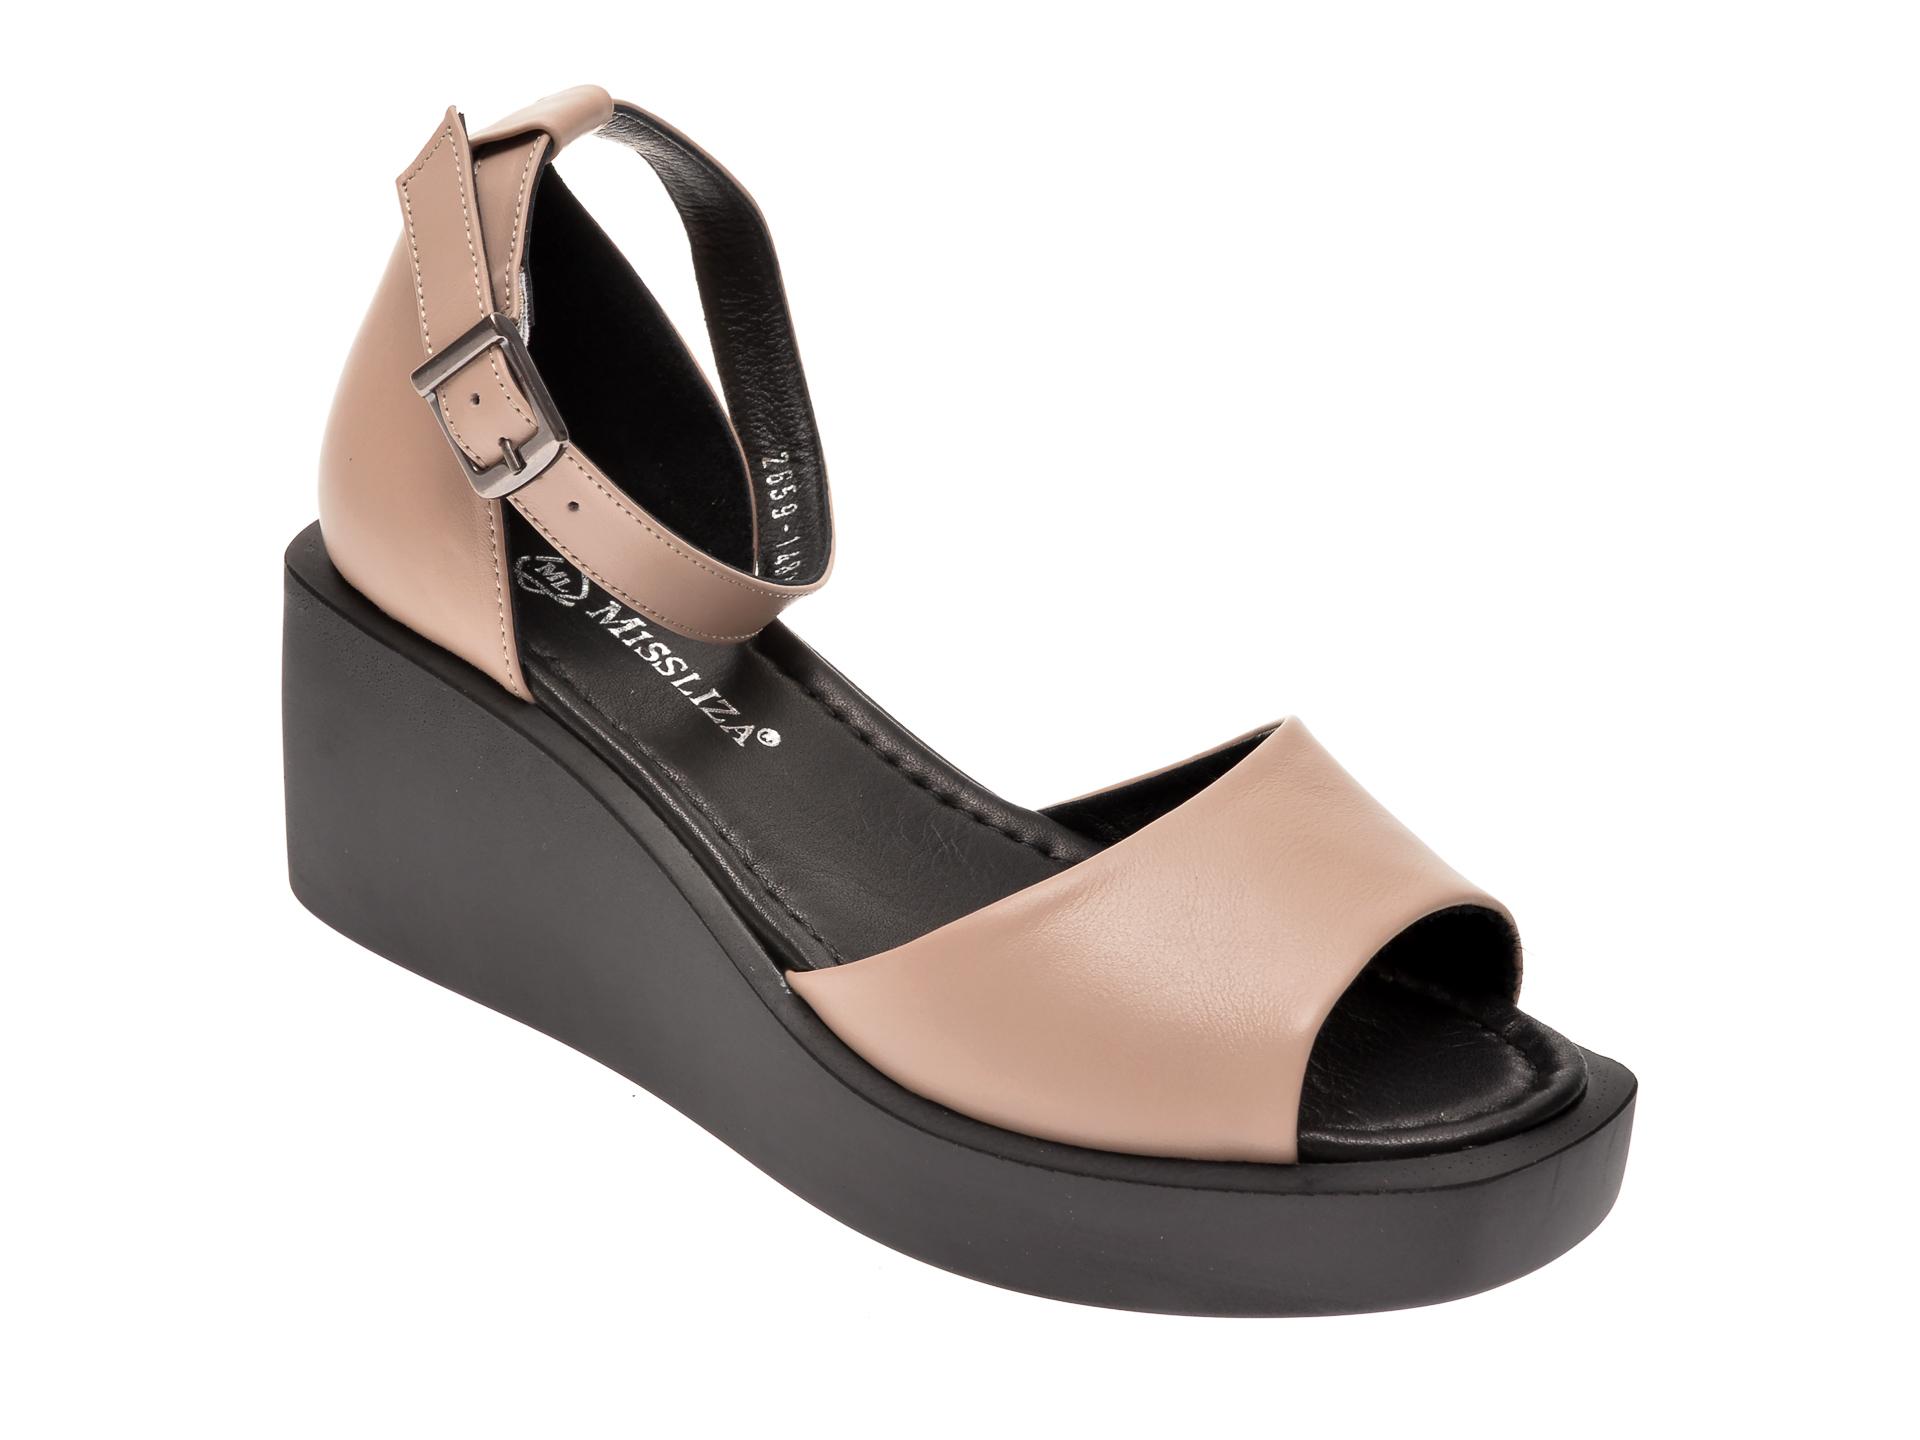 Sandale MISS LIZA gri, 1182659, din piele naturala imagine